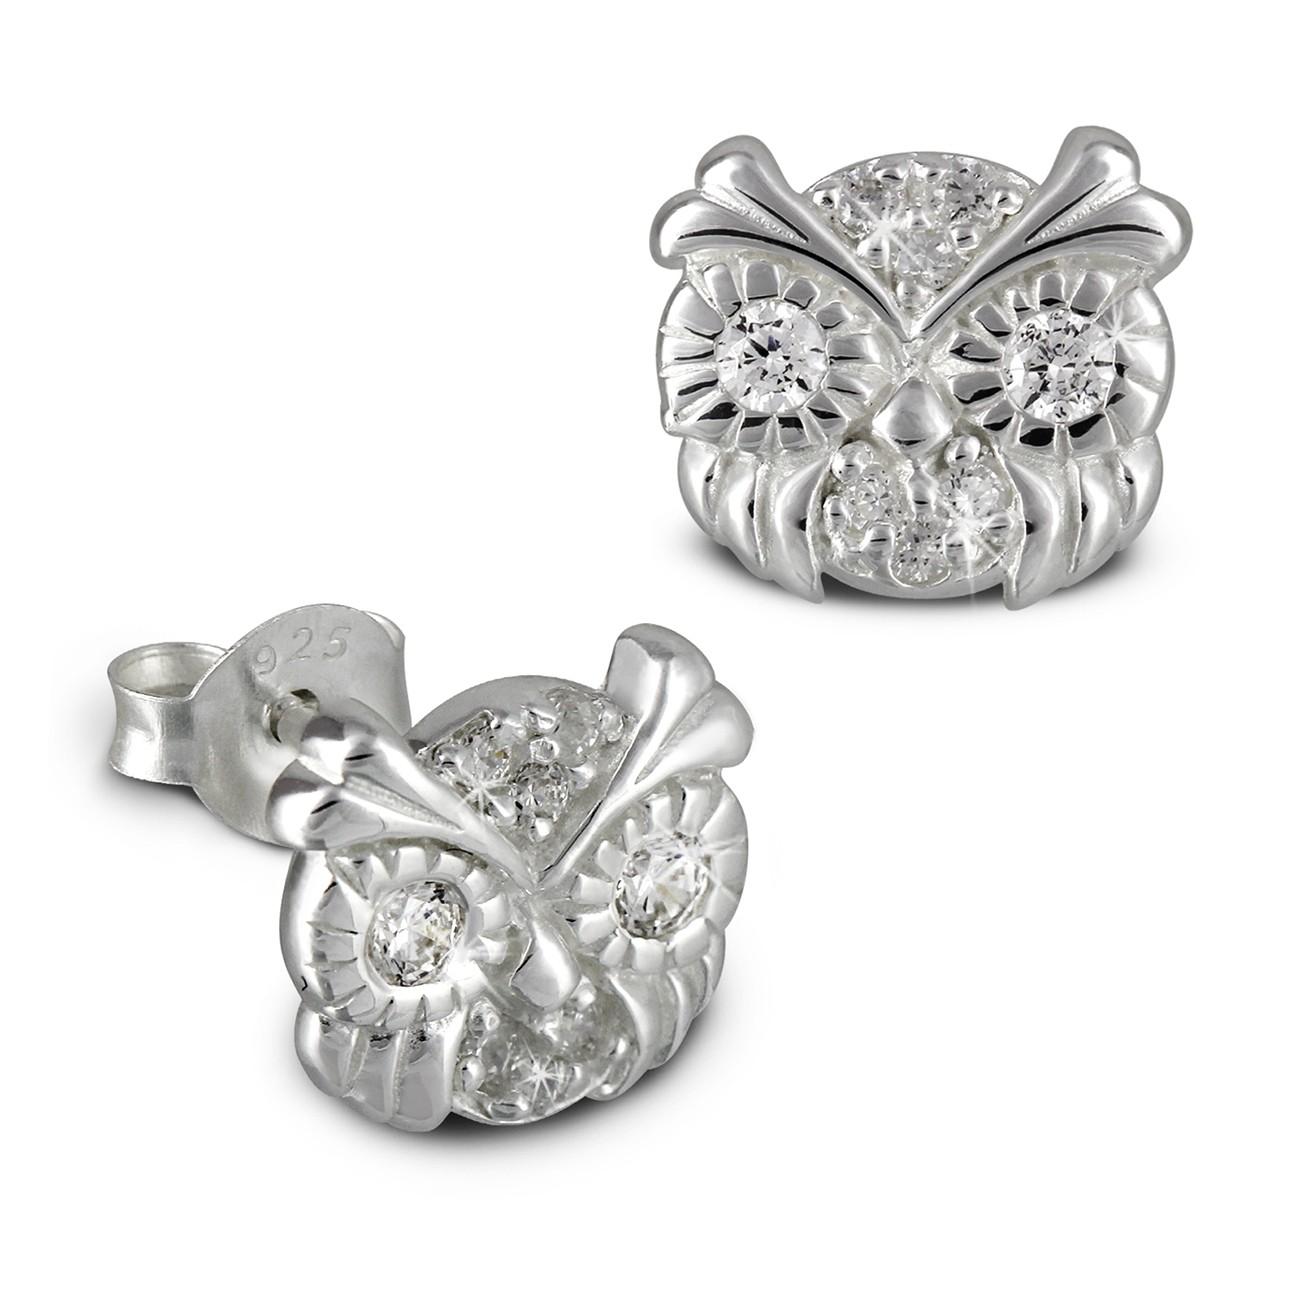 Kinder Ohrring Eulenkopf weiß Silber Ohrstecker Kinderschmuck TW SDO8012W